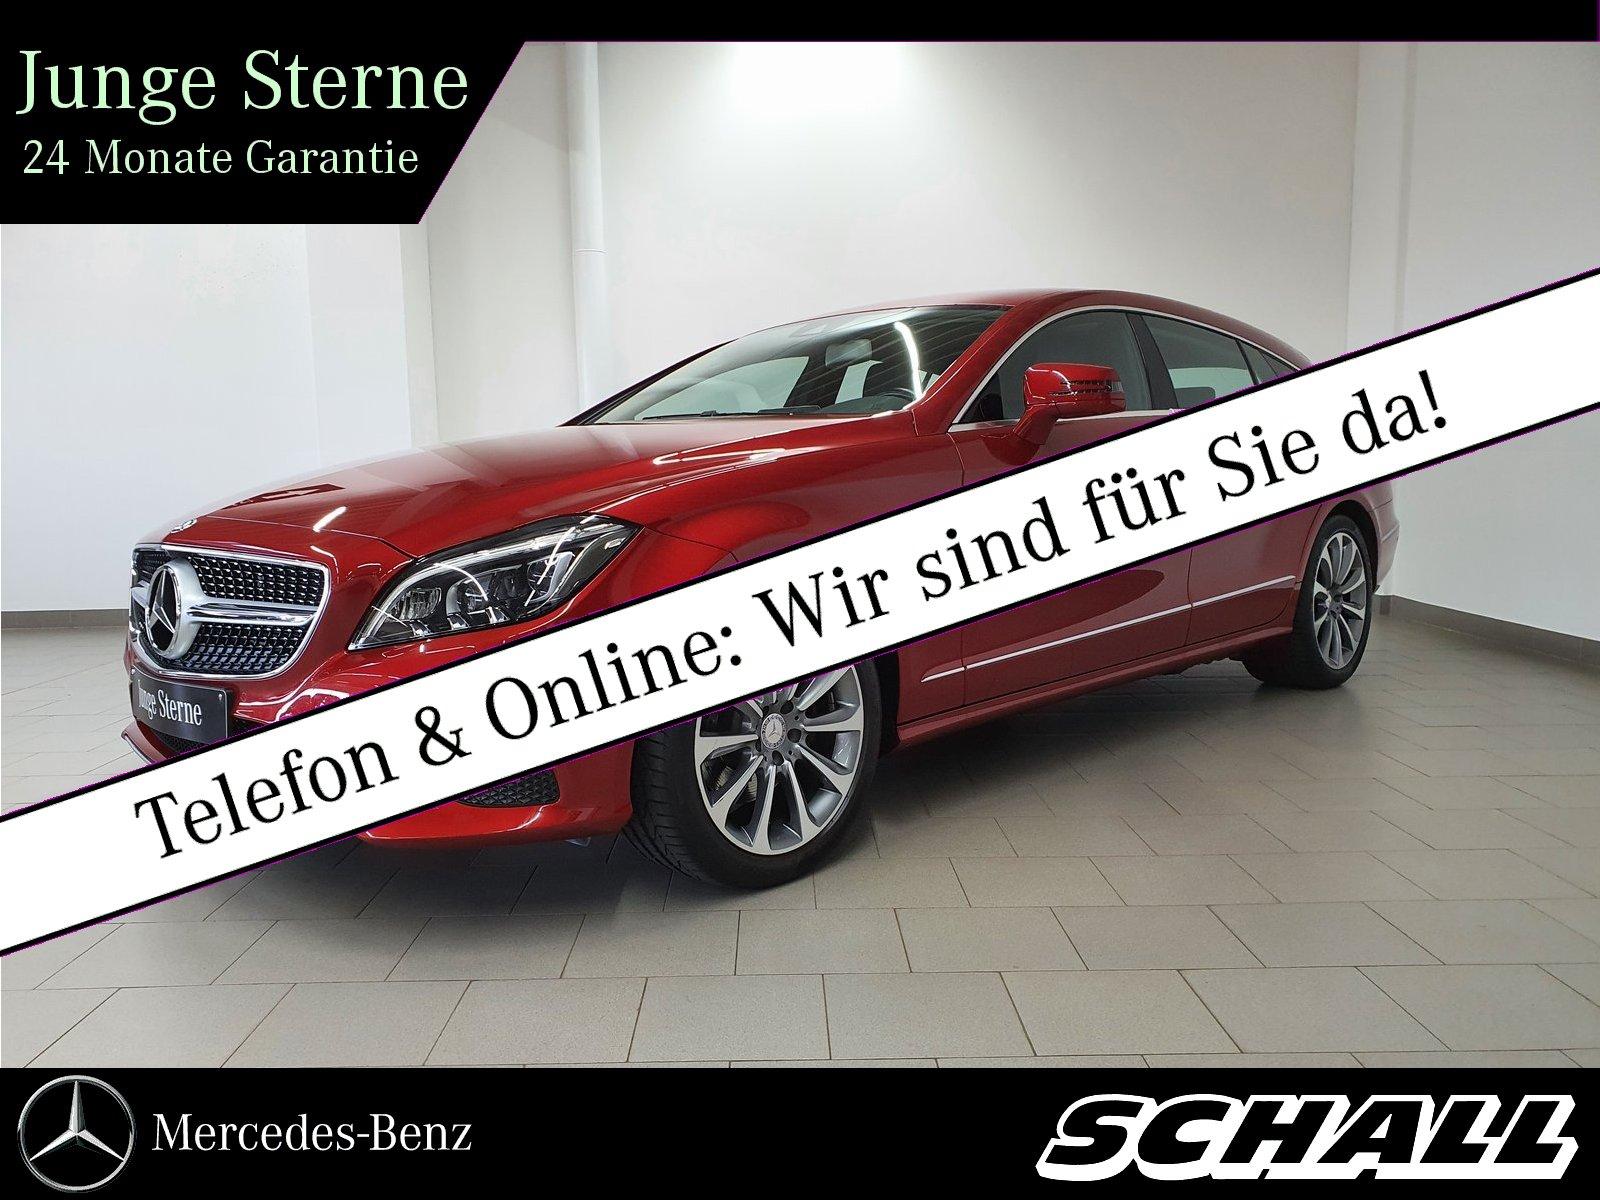 Mercedes-Benz CLS 250 d SB AHK/GSHD/BURMES/MULTIBEAM/360°/SPUR, Jahr 2016, Diesel